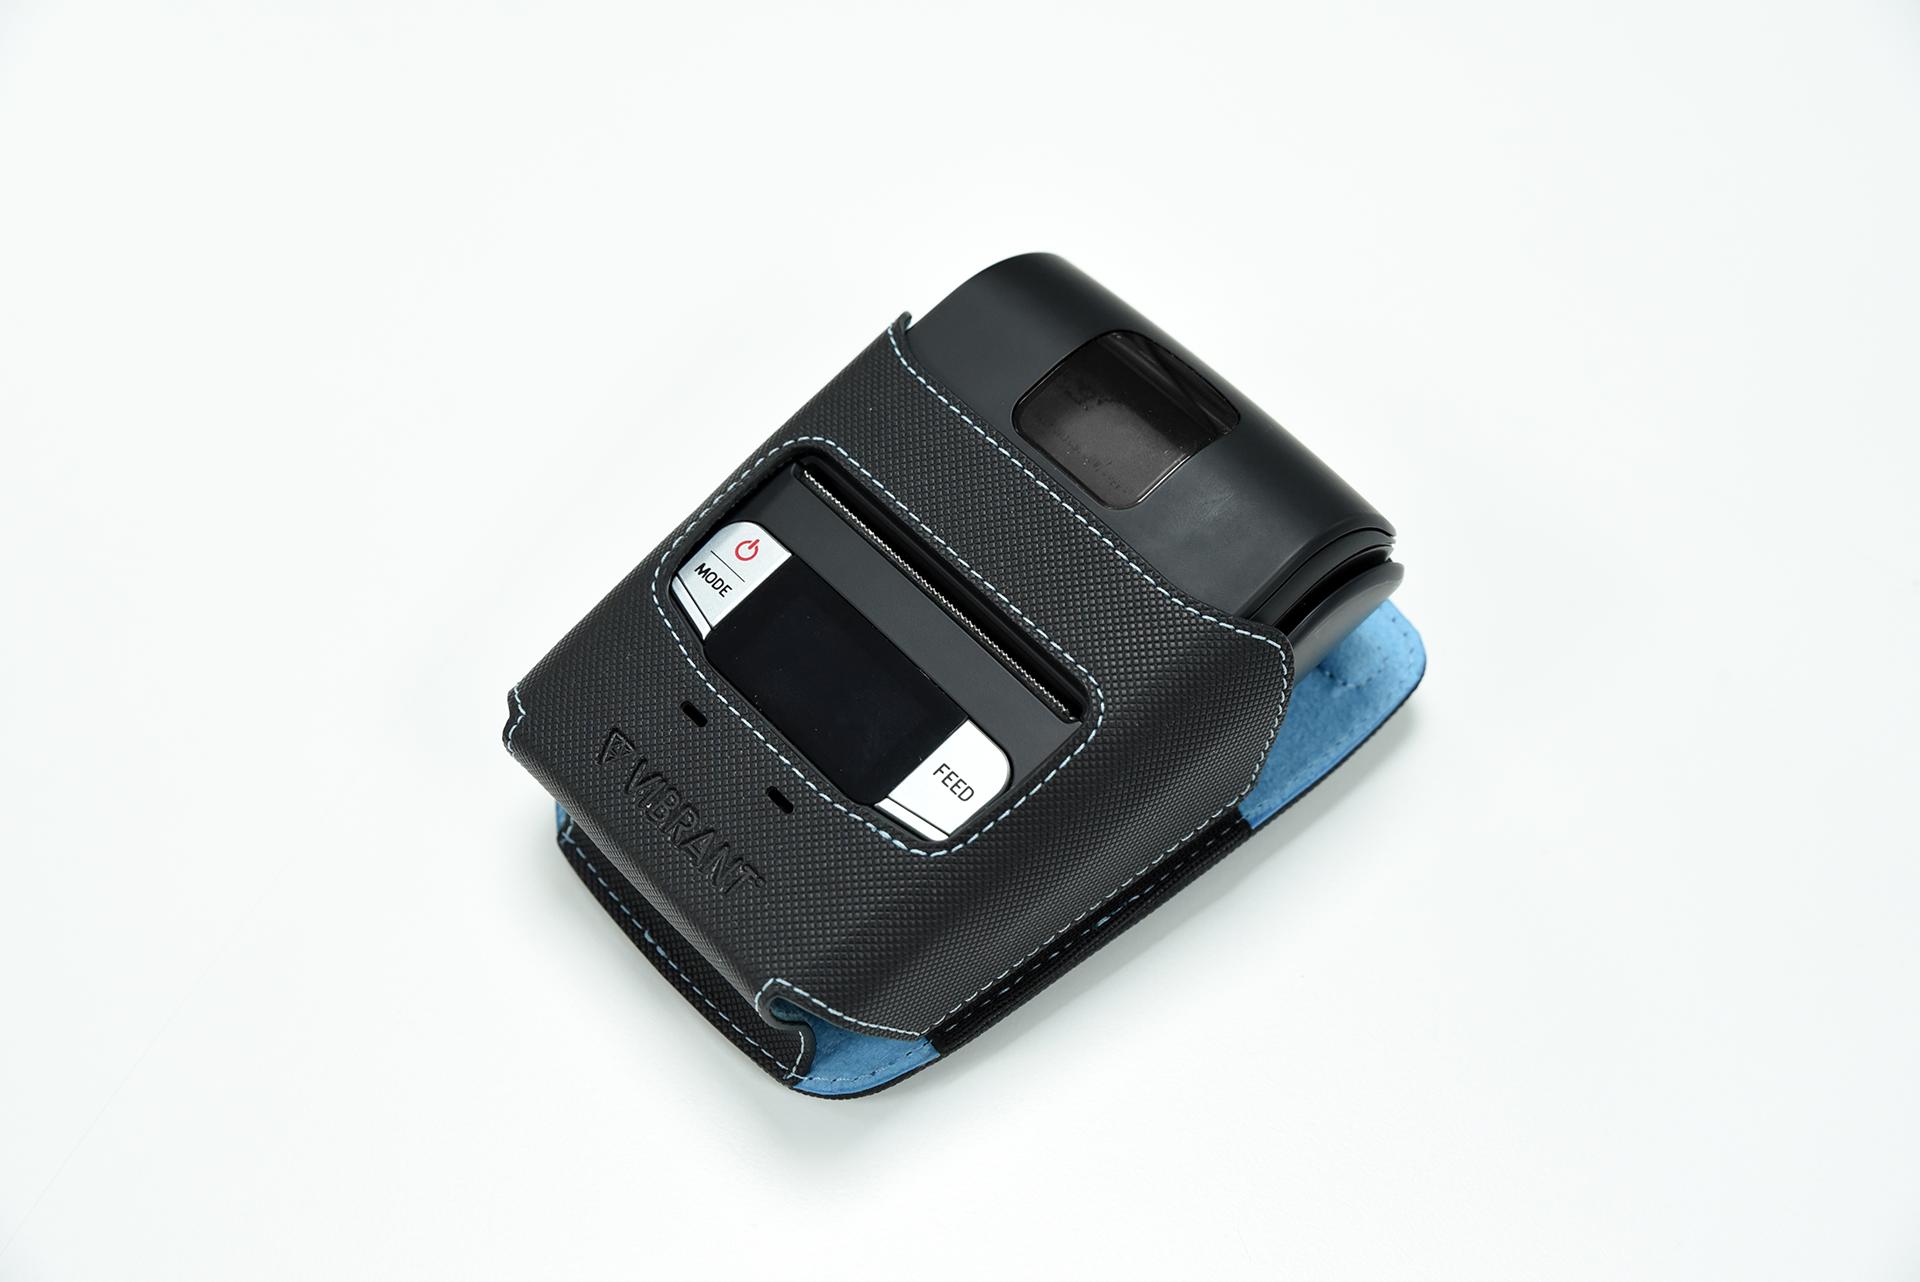 Vprint Mobile bluetooth printer holster case Grid 3.png